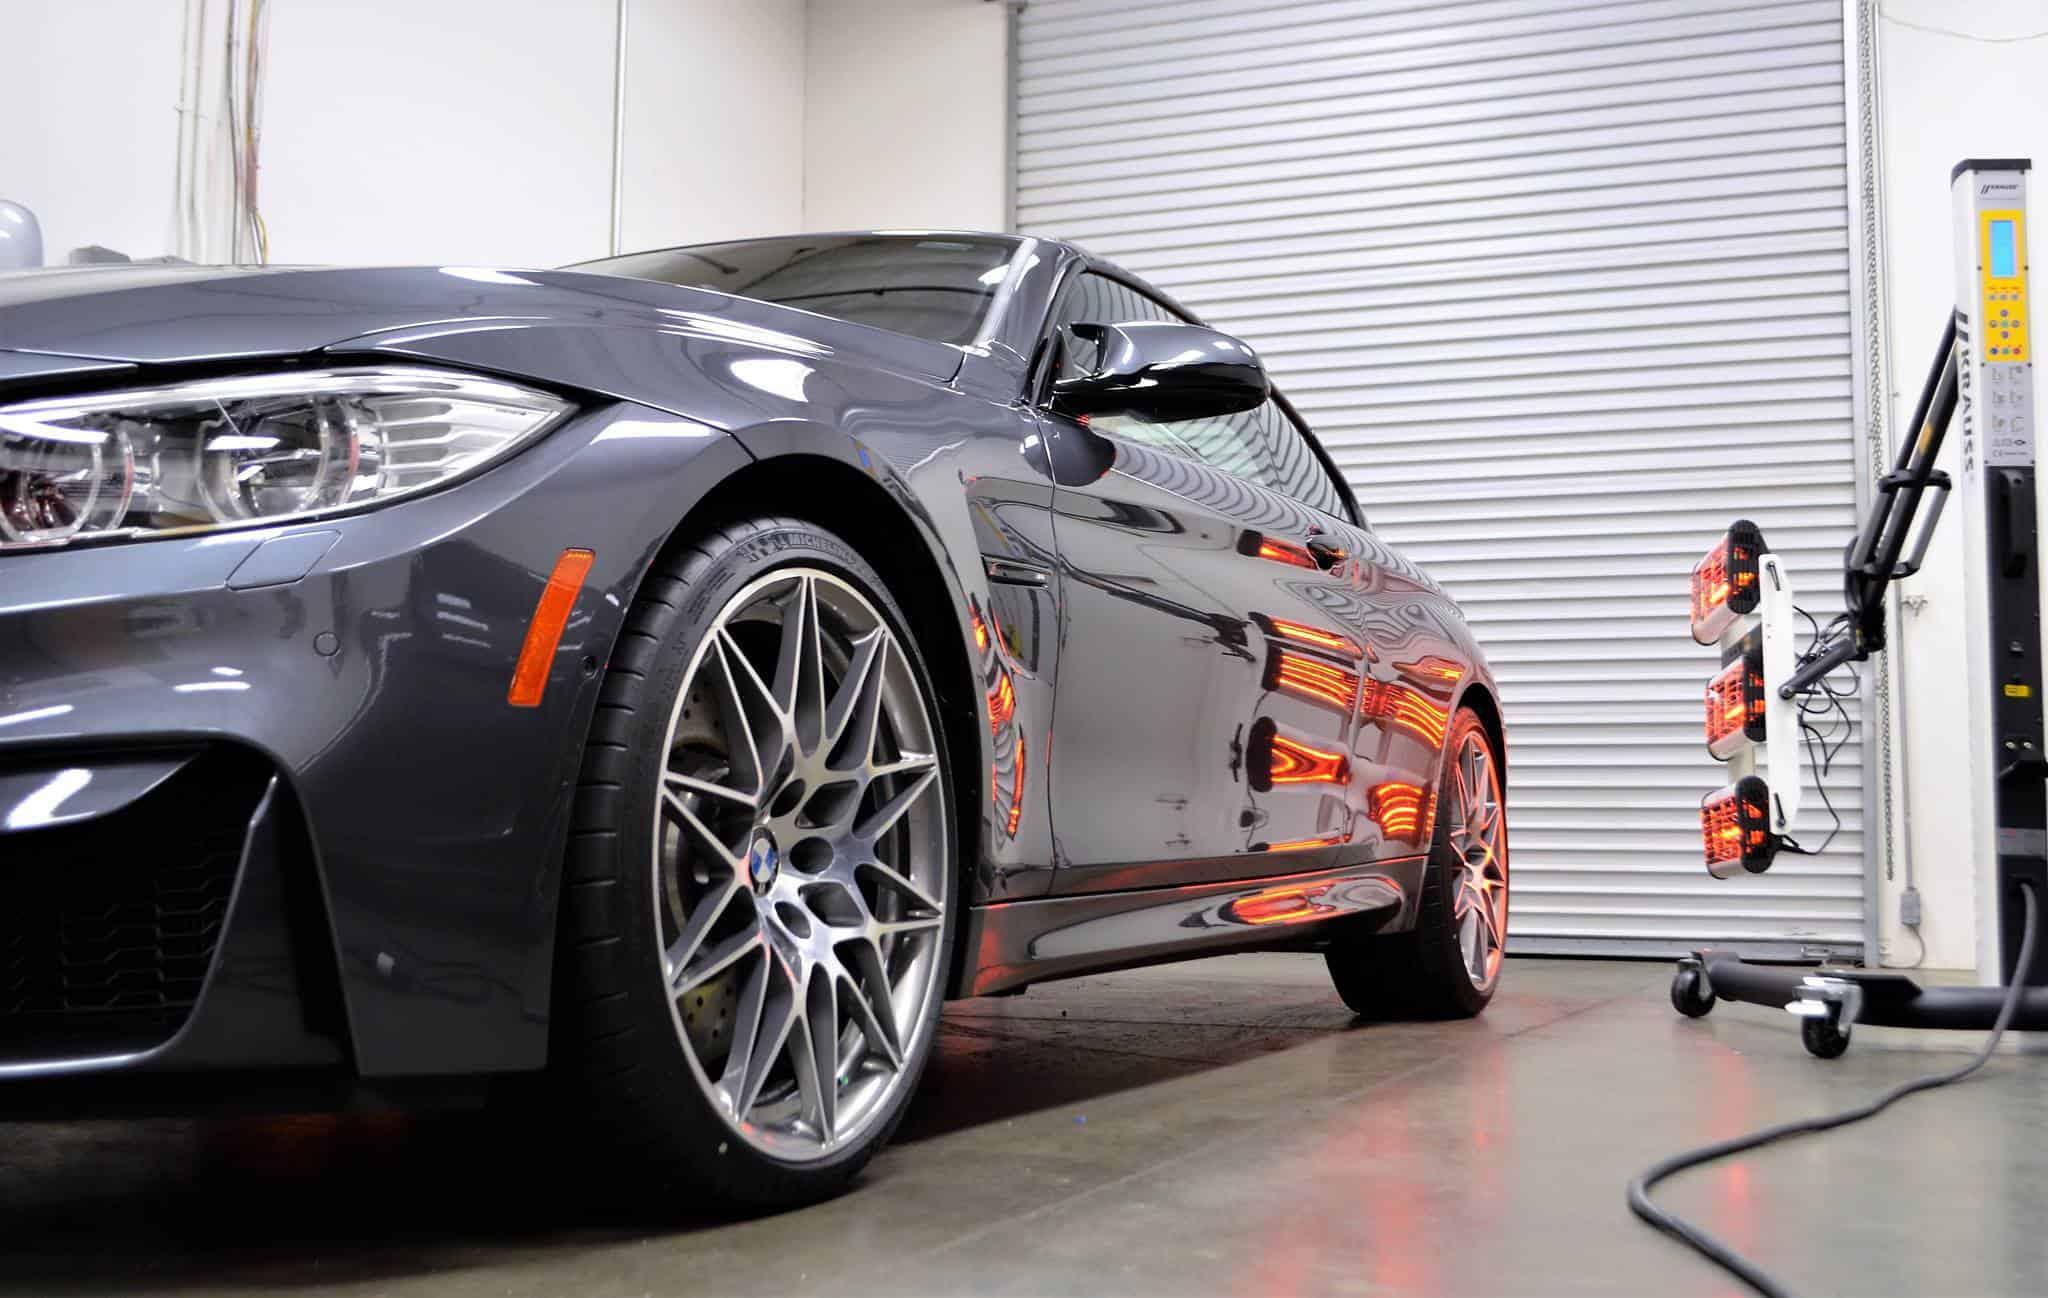 BMW M4 nano coating curing